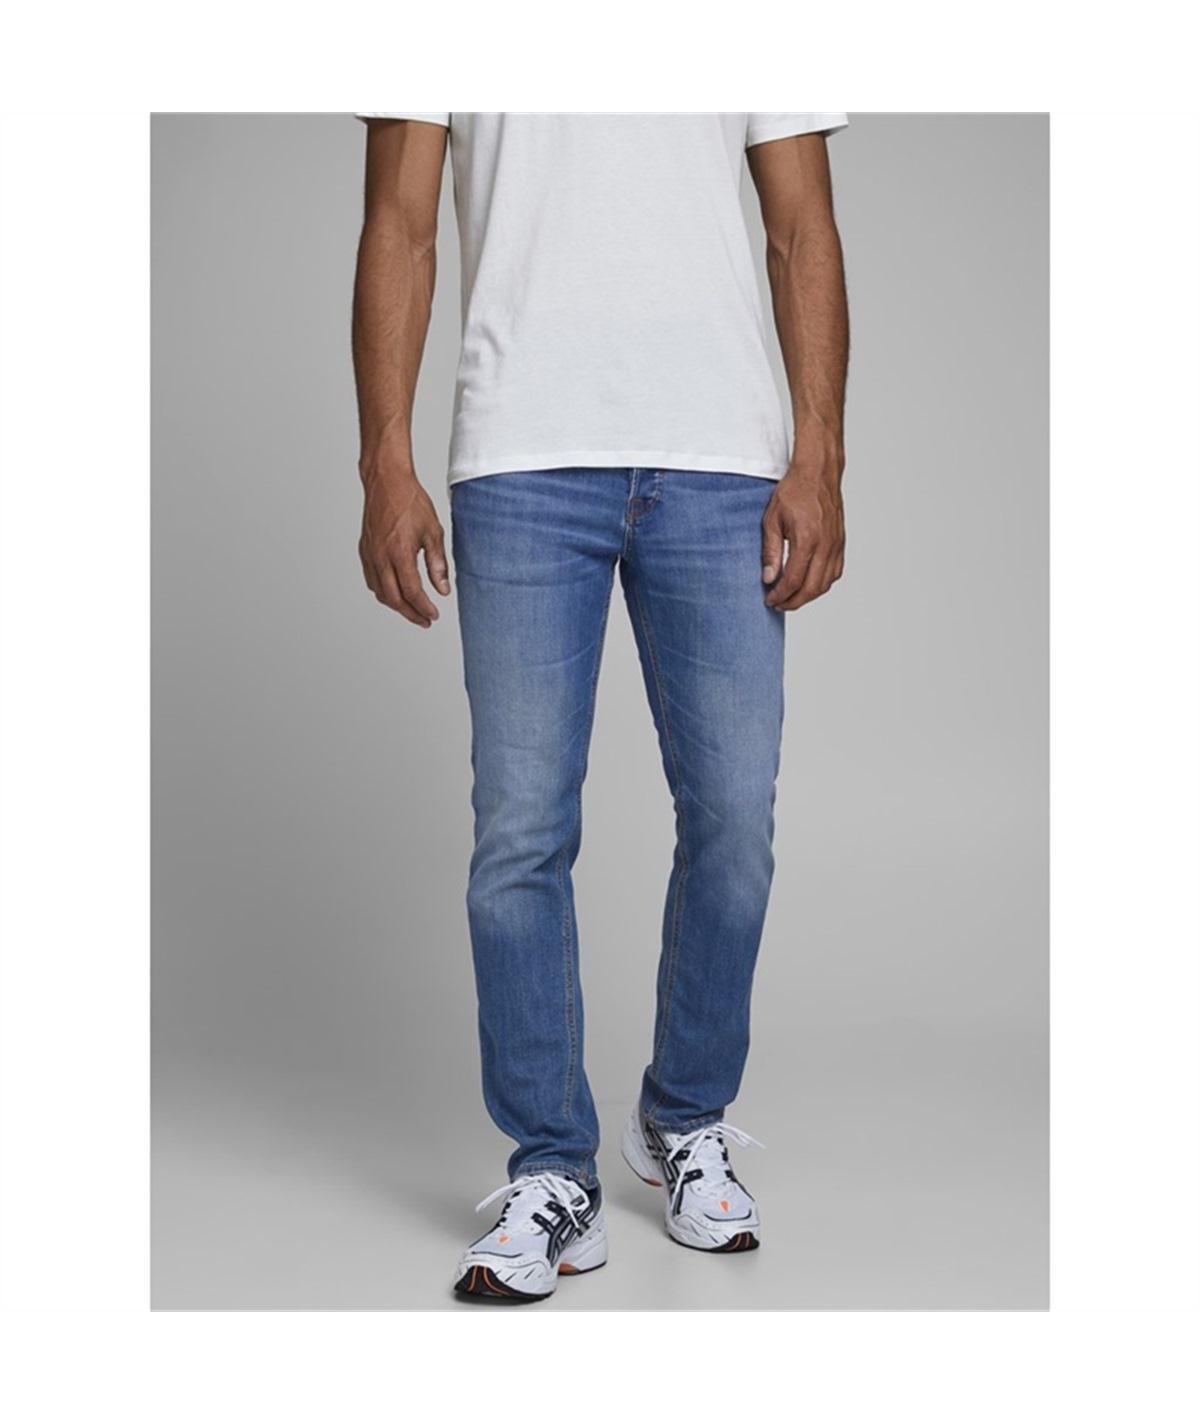 12157416_BlueDenim_jeans jack jones